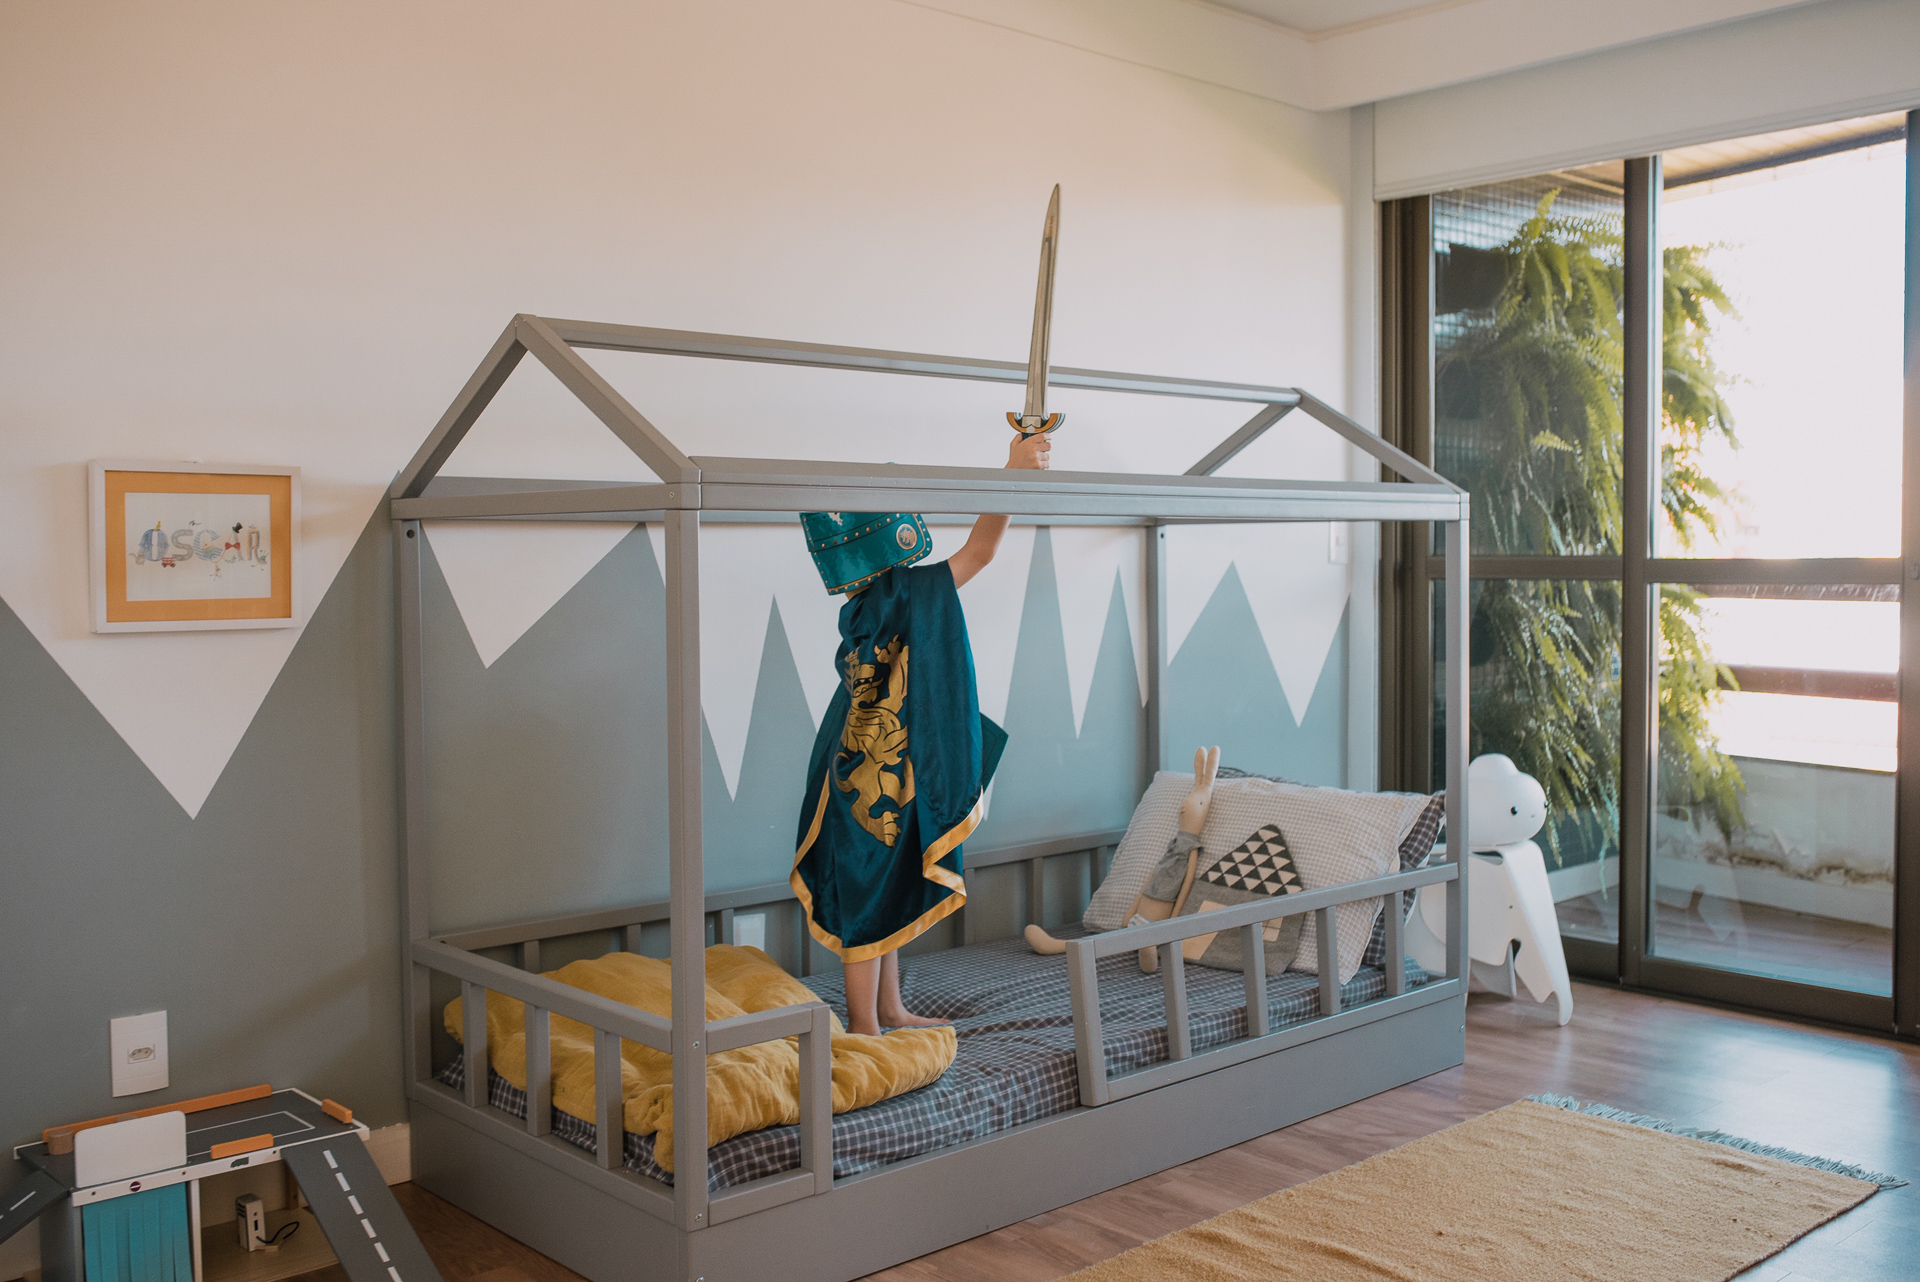 Cama    e a    estante Ameise Design    /  Roupa de cama,  Camomile London /